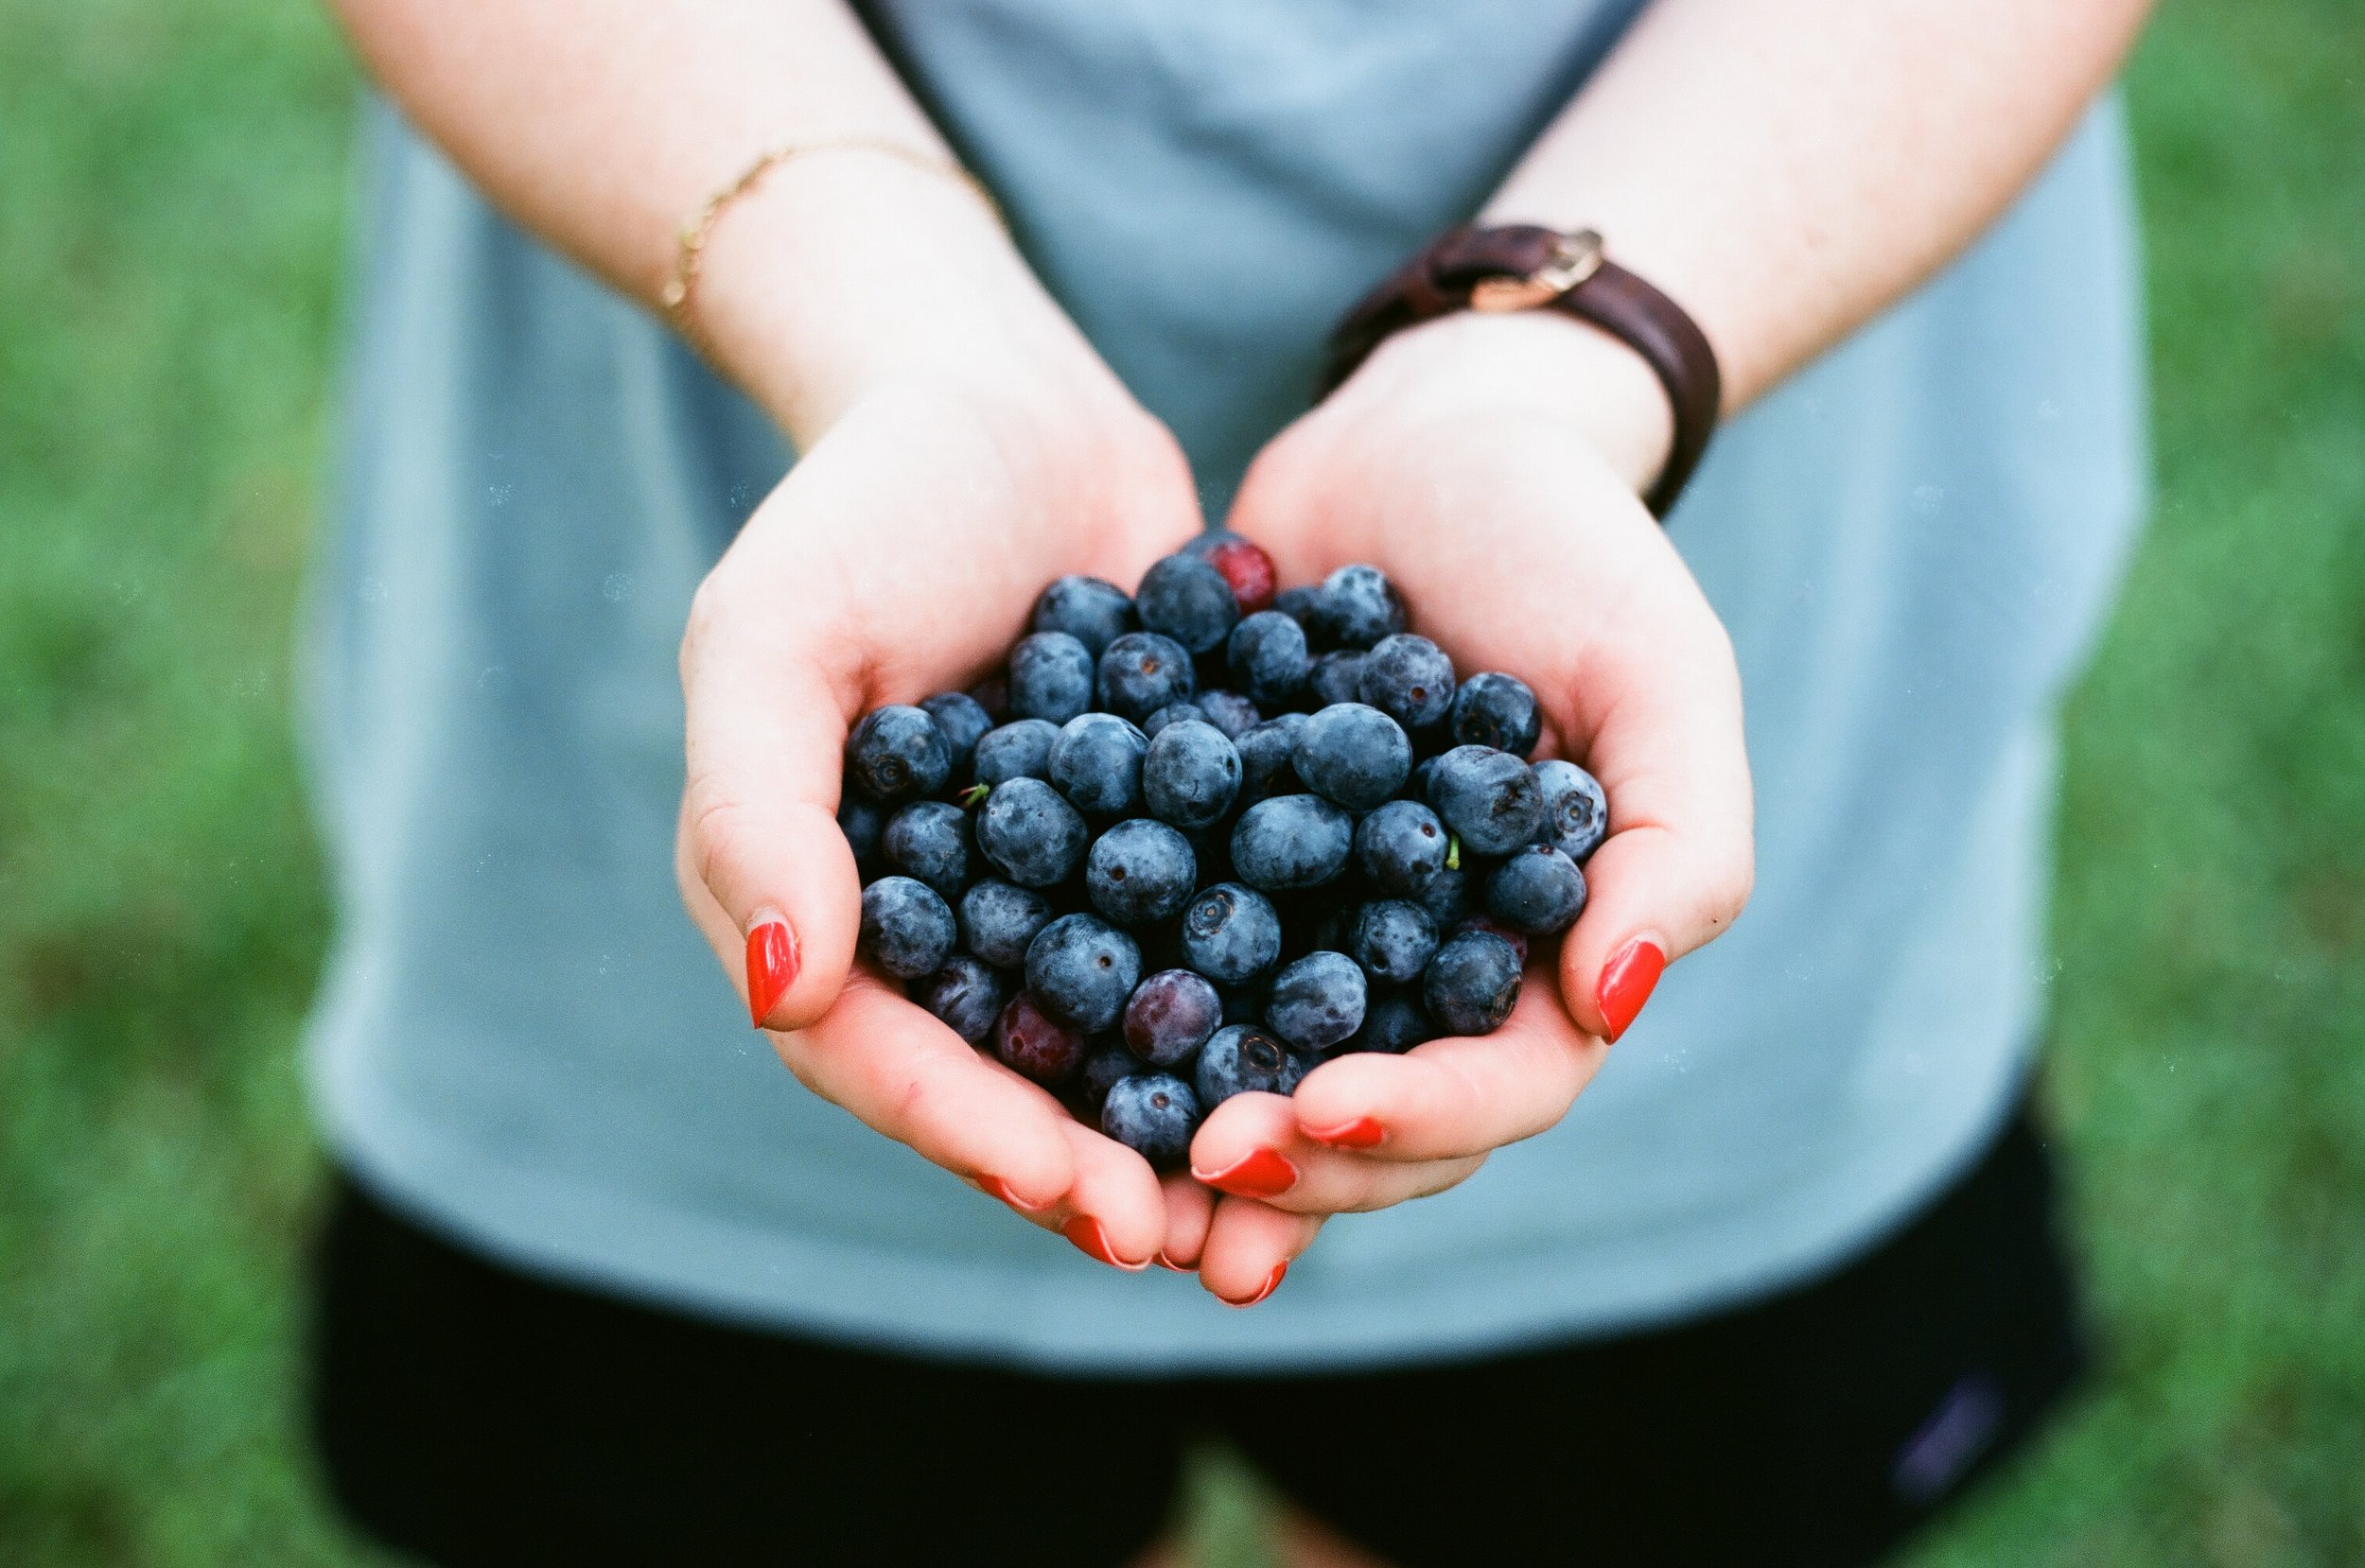 blueberry-Blaubeere-Heidelbeere-fruit-Sommer-Obst